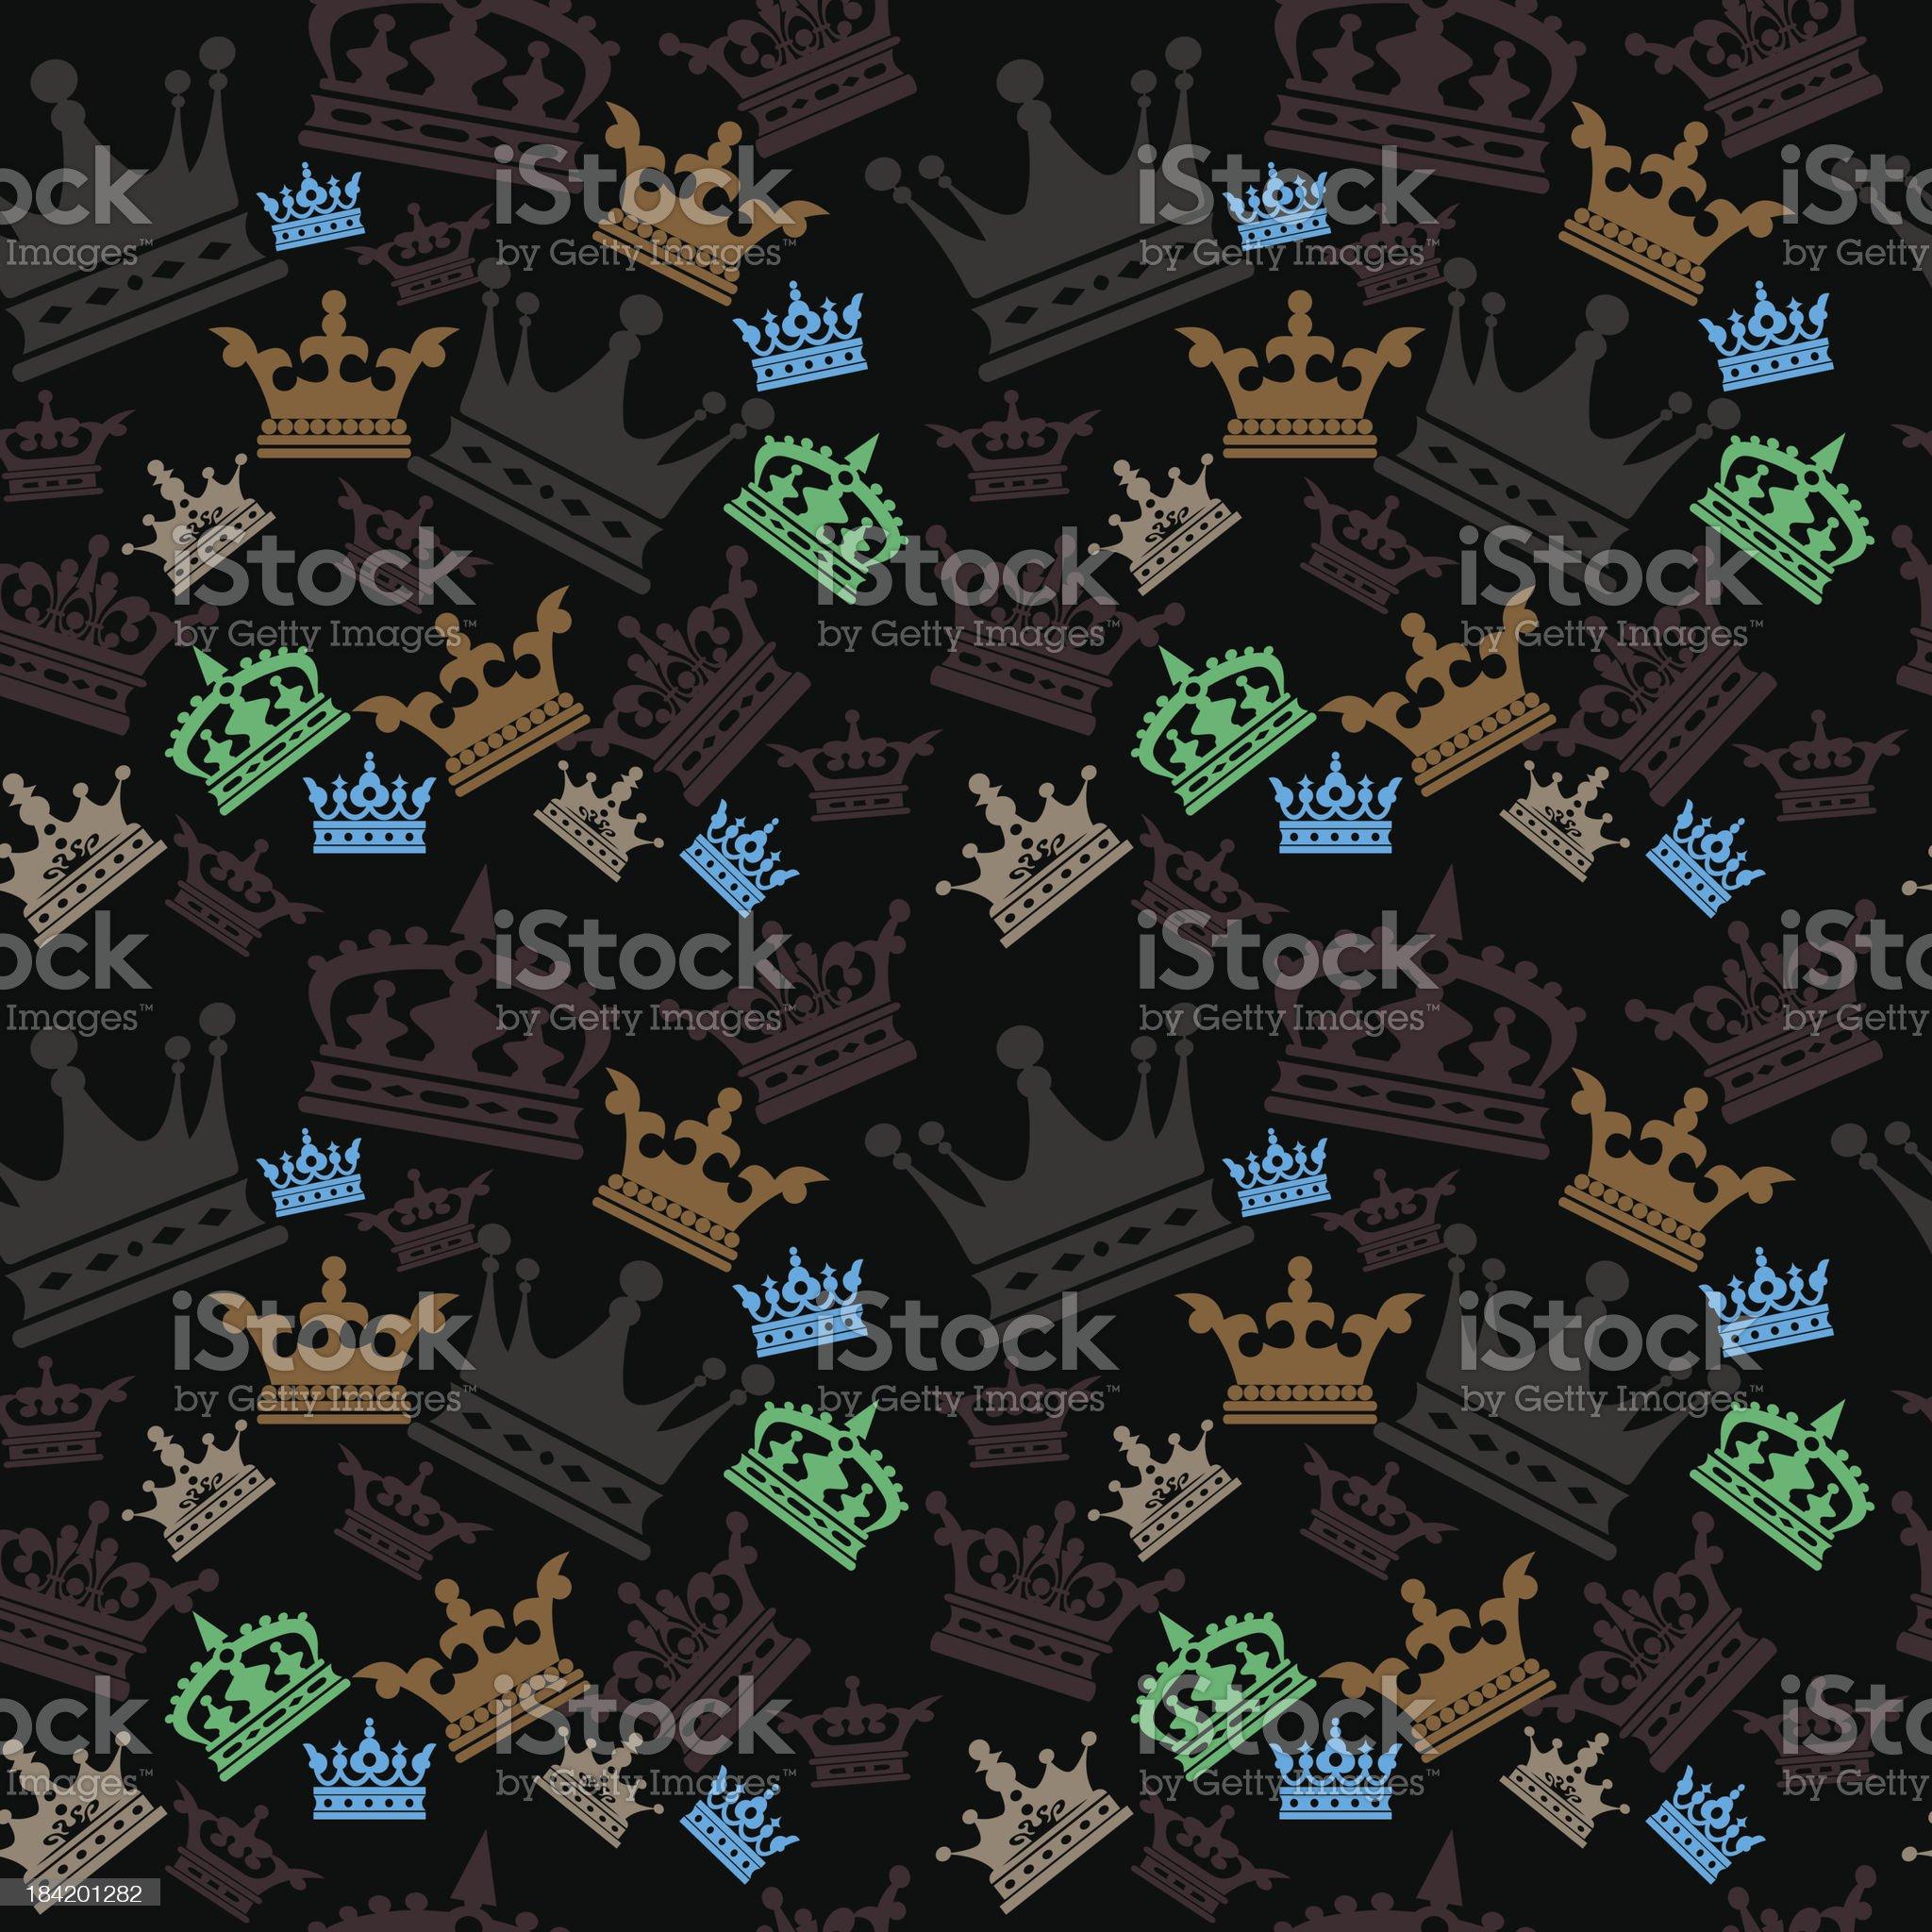 vector. seamless pattern. wallpaper royalty-free stock vector art